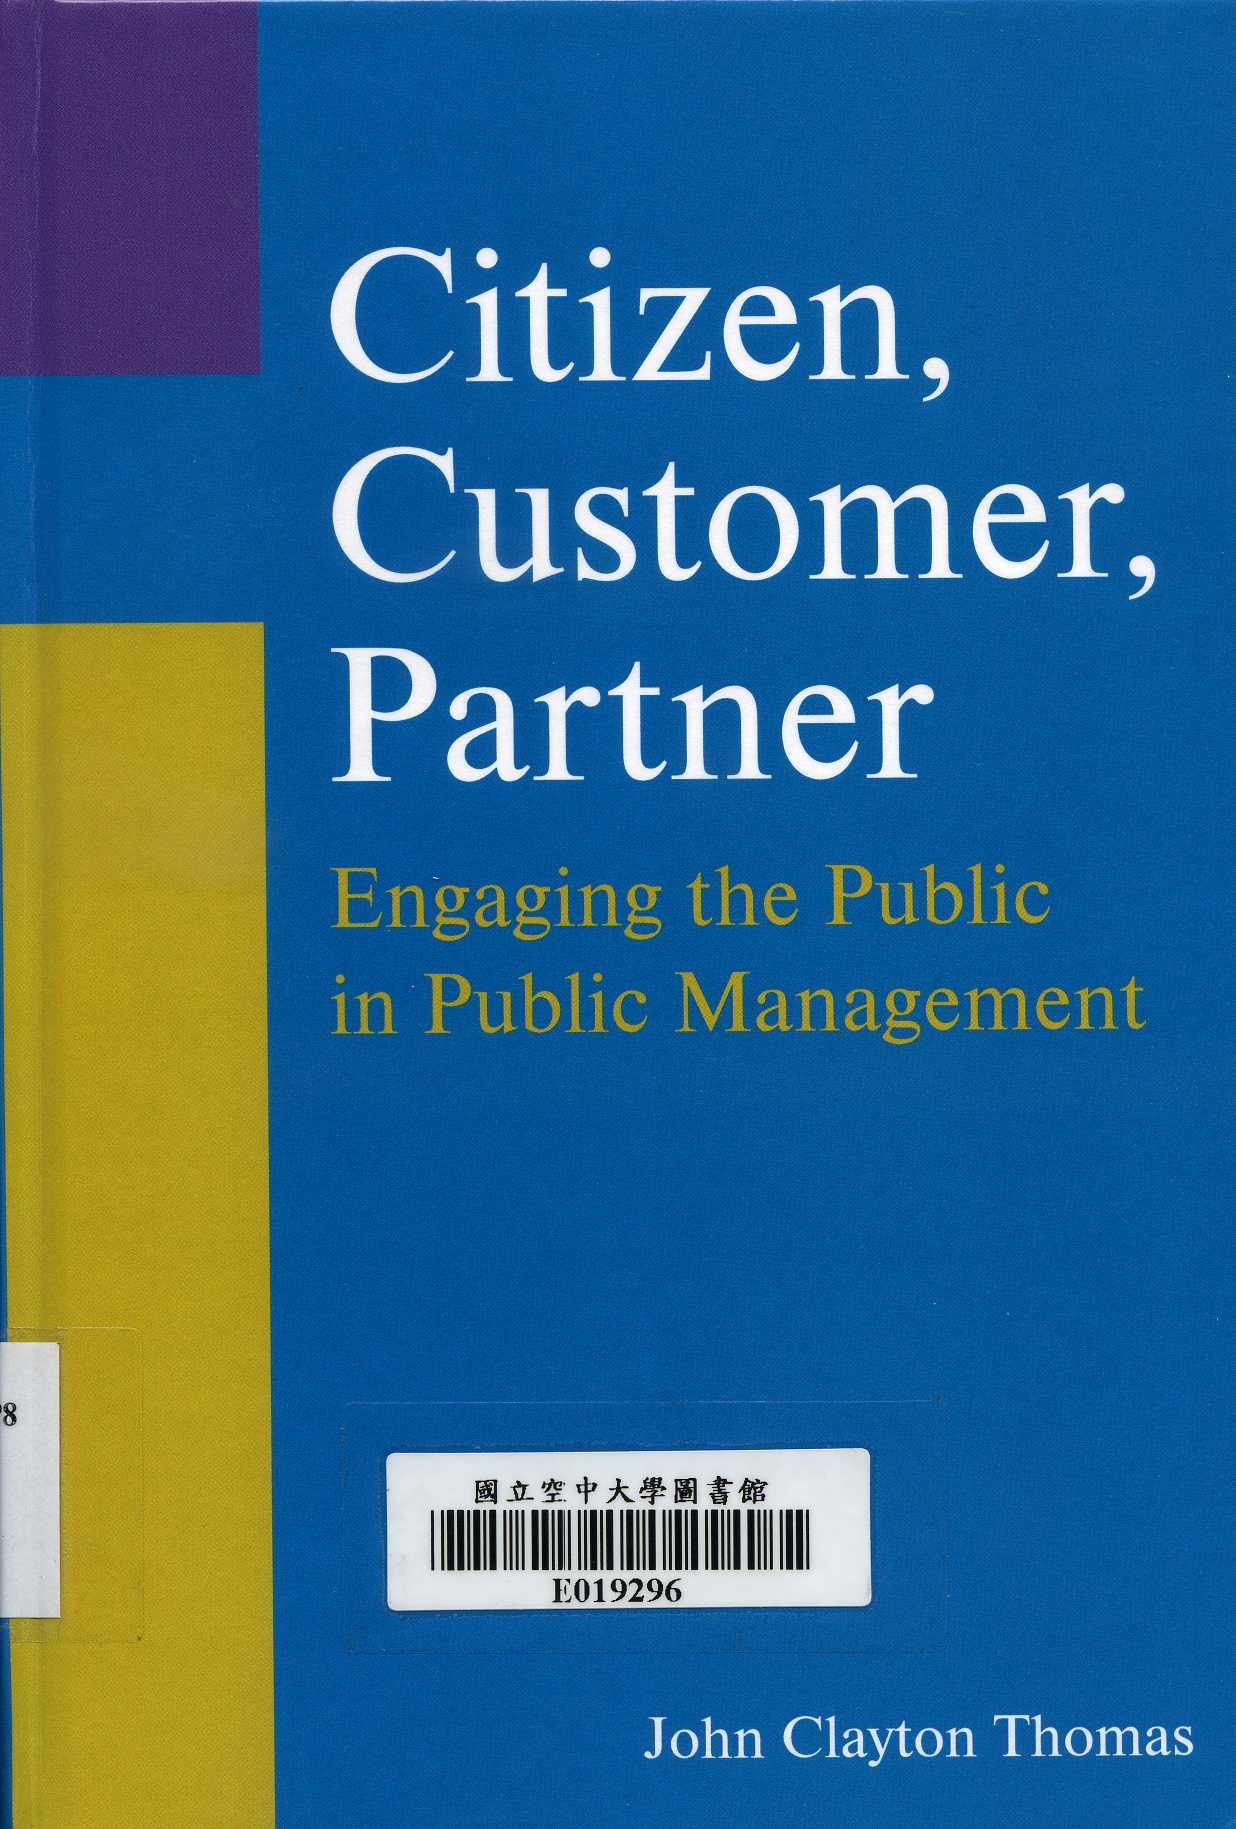 Citizen, customer, partner : engaging the public in public management / John Clayton Thomas.